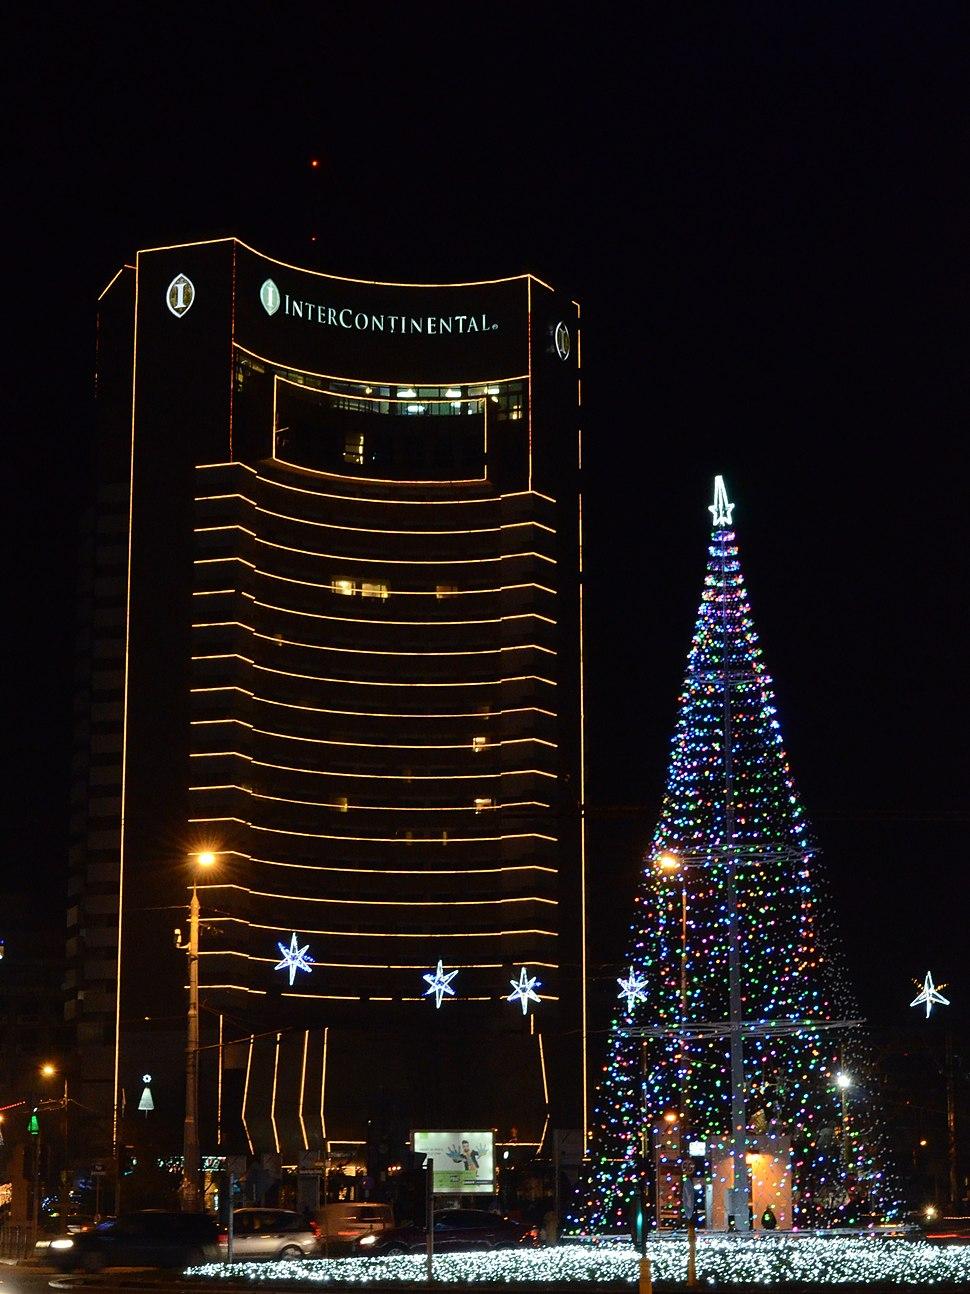 University Square, Bucharest (at night)